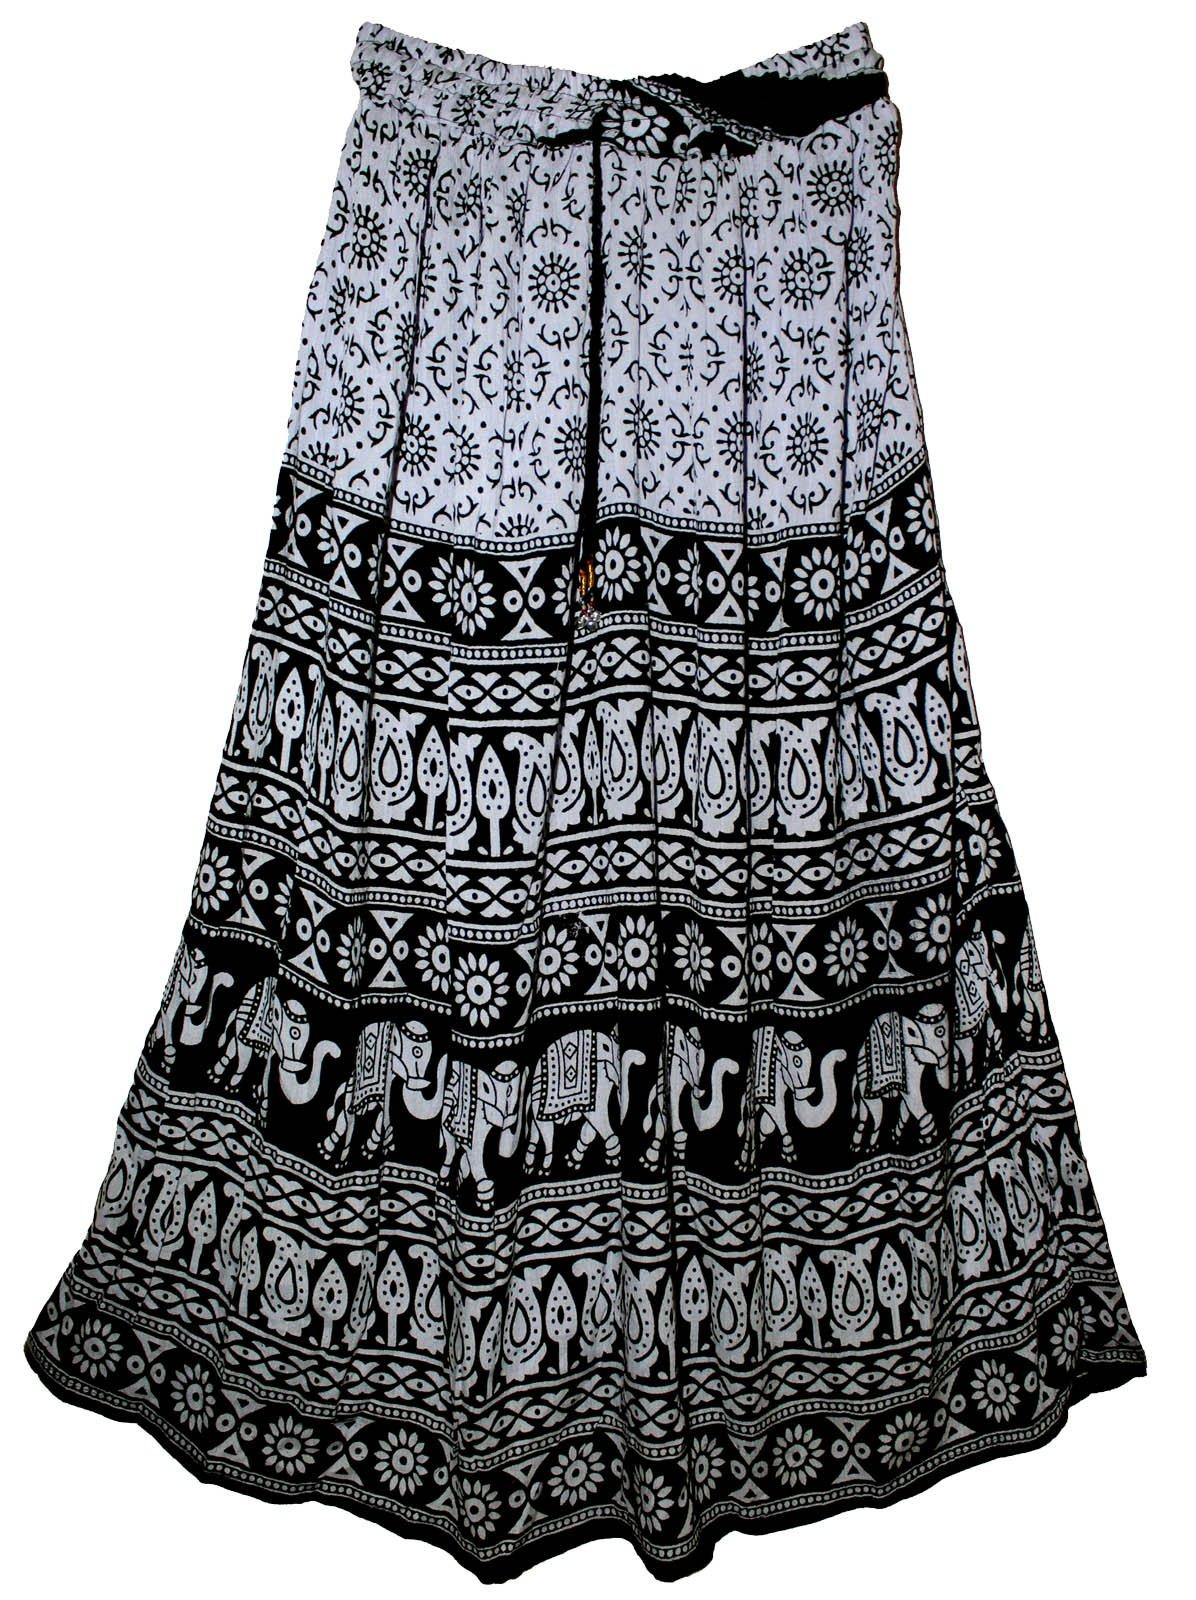 FOI Rayon Indian Hippy Skirt Wrinkle Kjol Jupe Rock Gypsy Retro Boho Falda Women